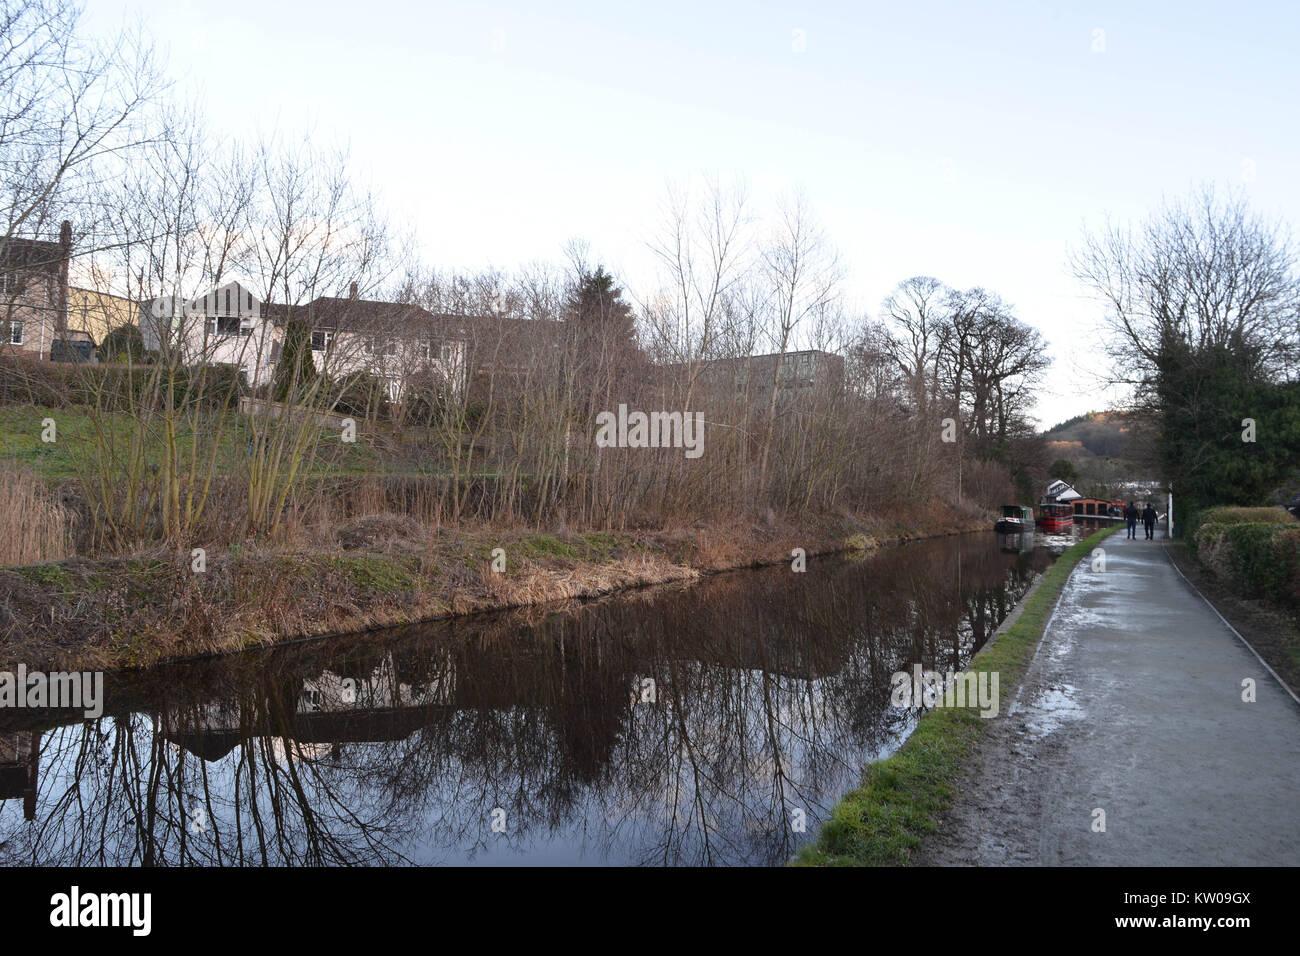 Llangollen, Denbighshire, North Wales Stock Photo